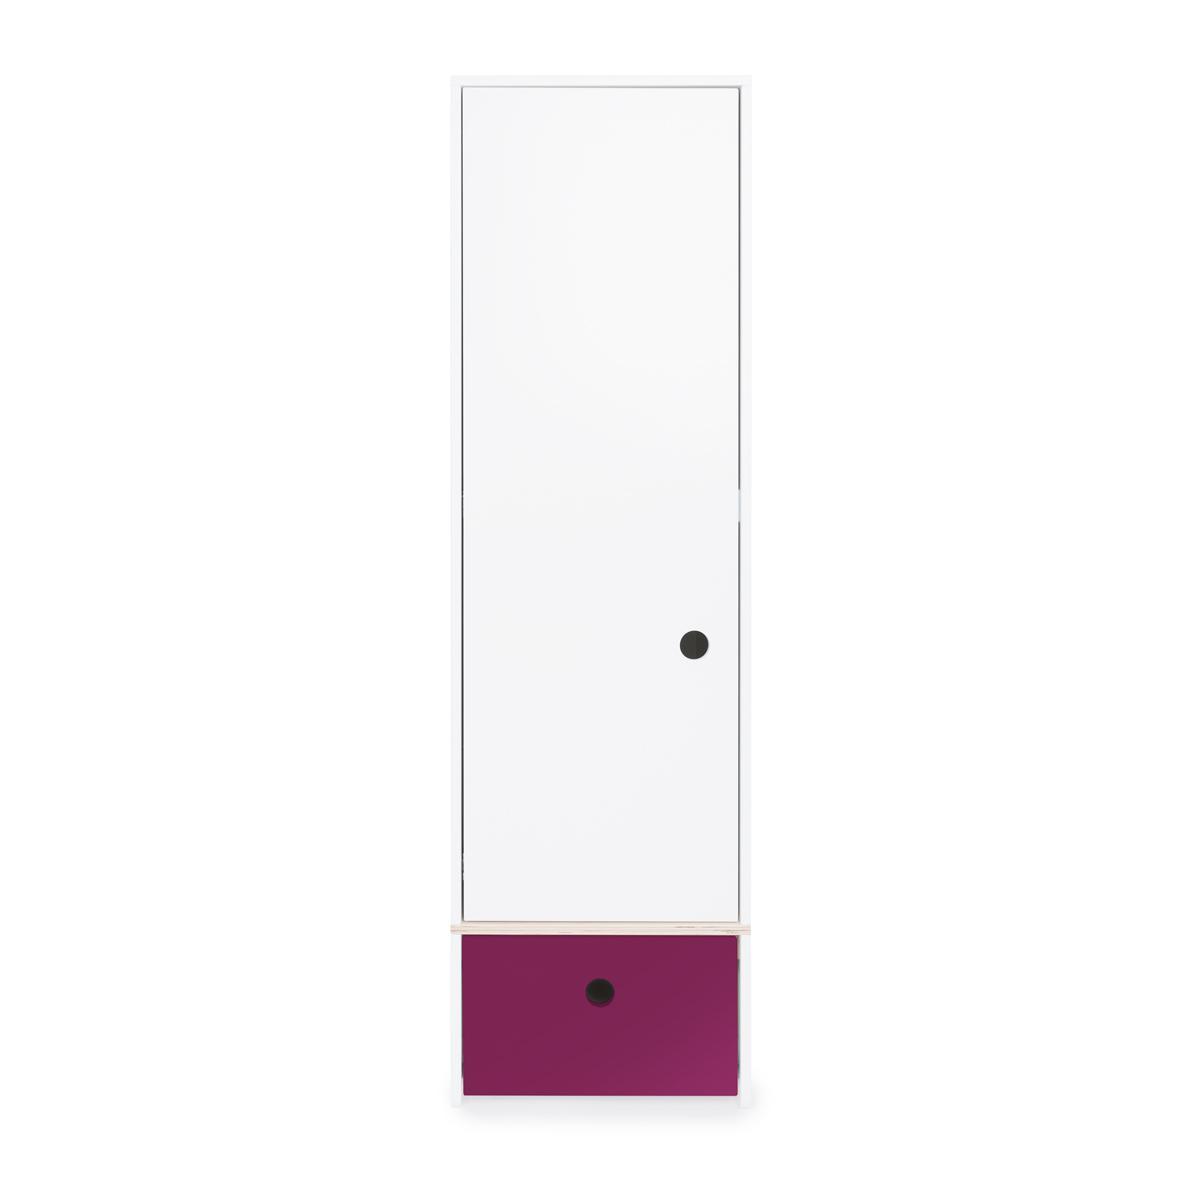 Armoire 1 porte façade tiroir prune